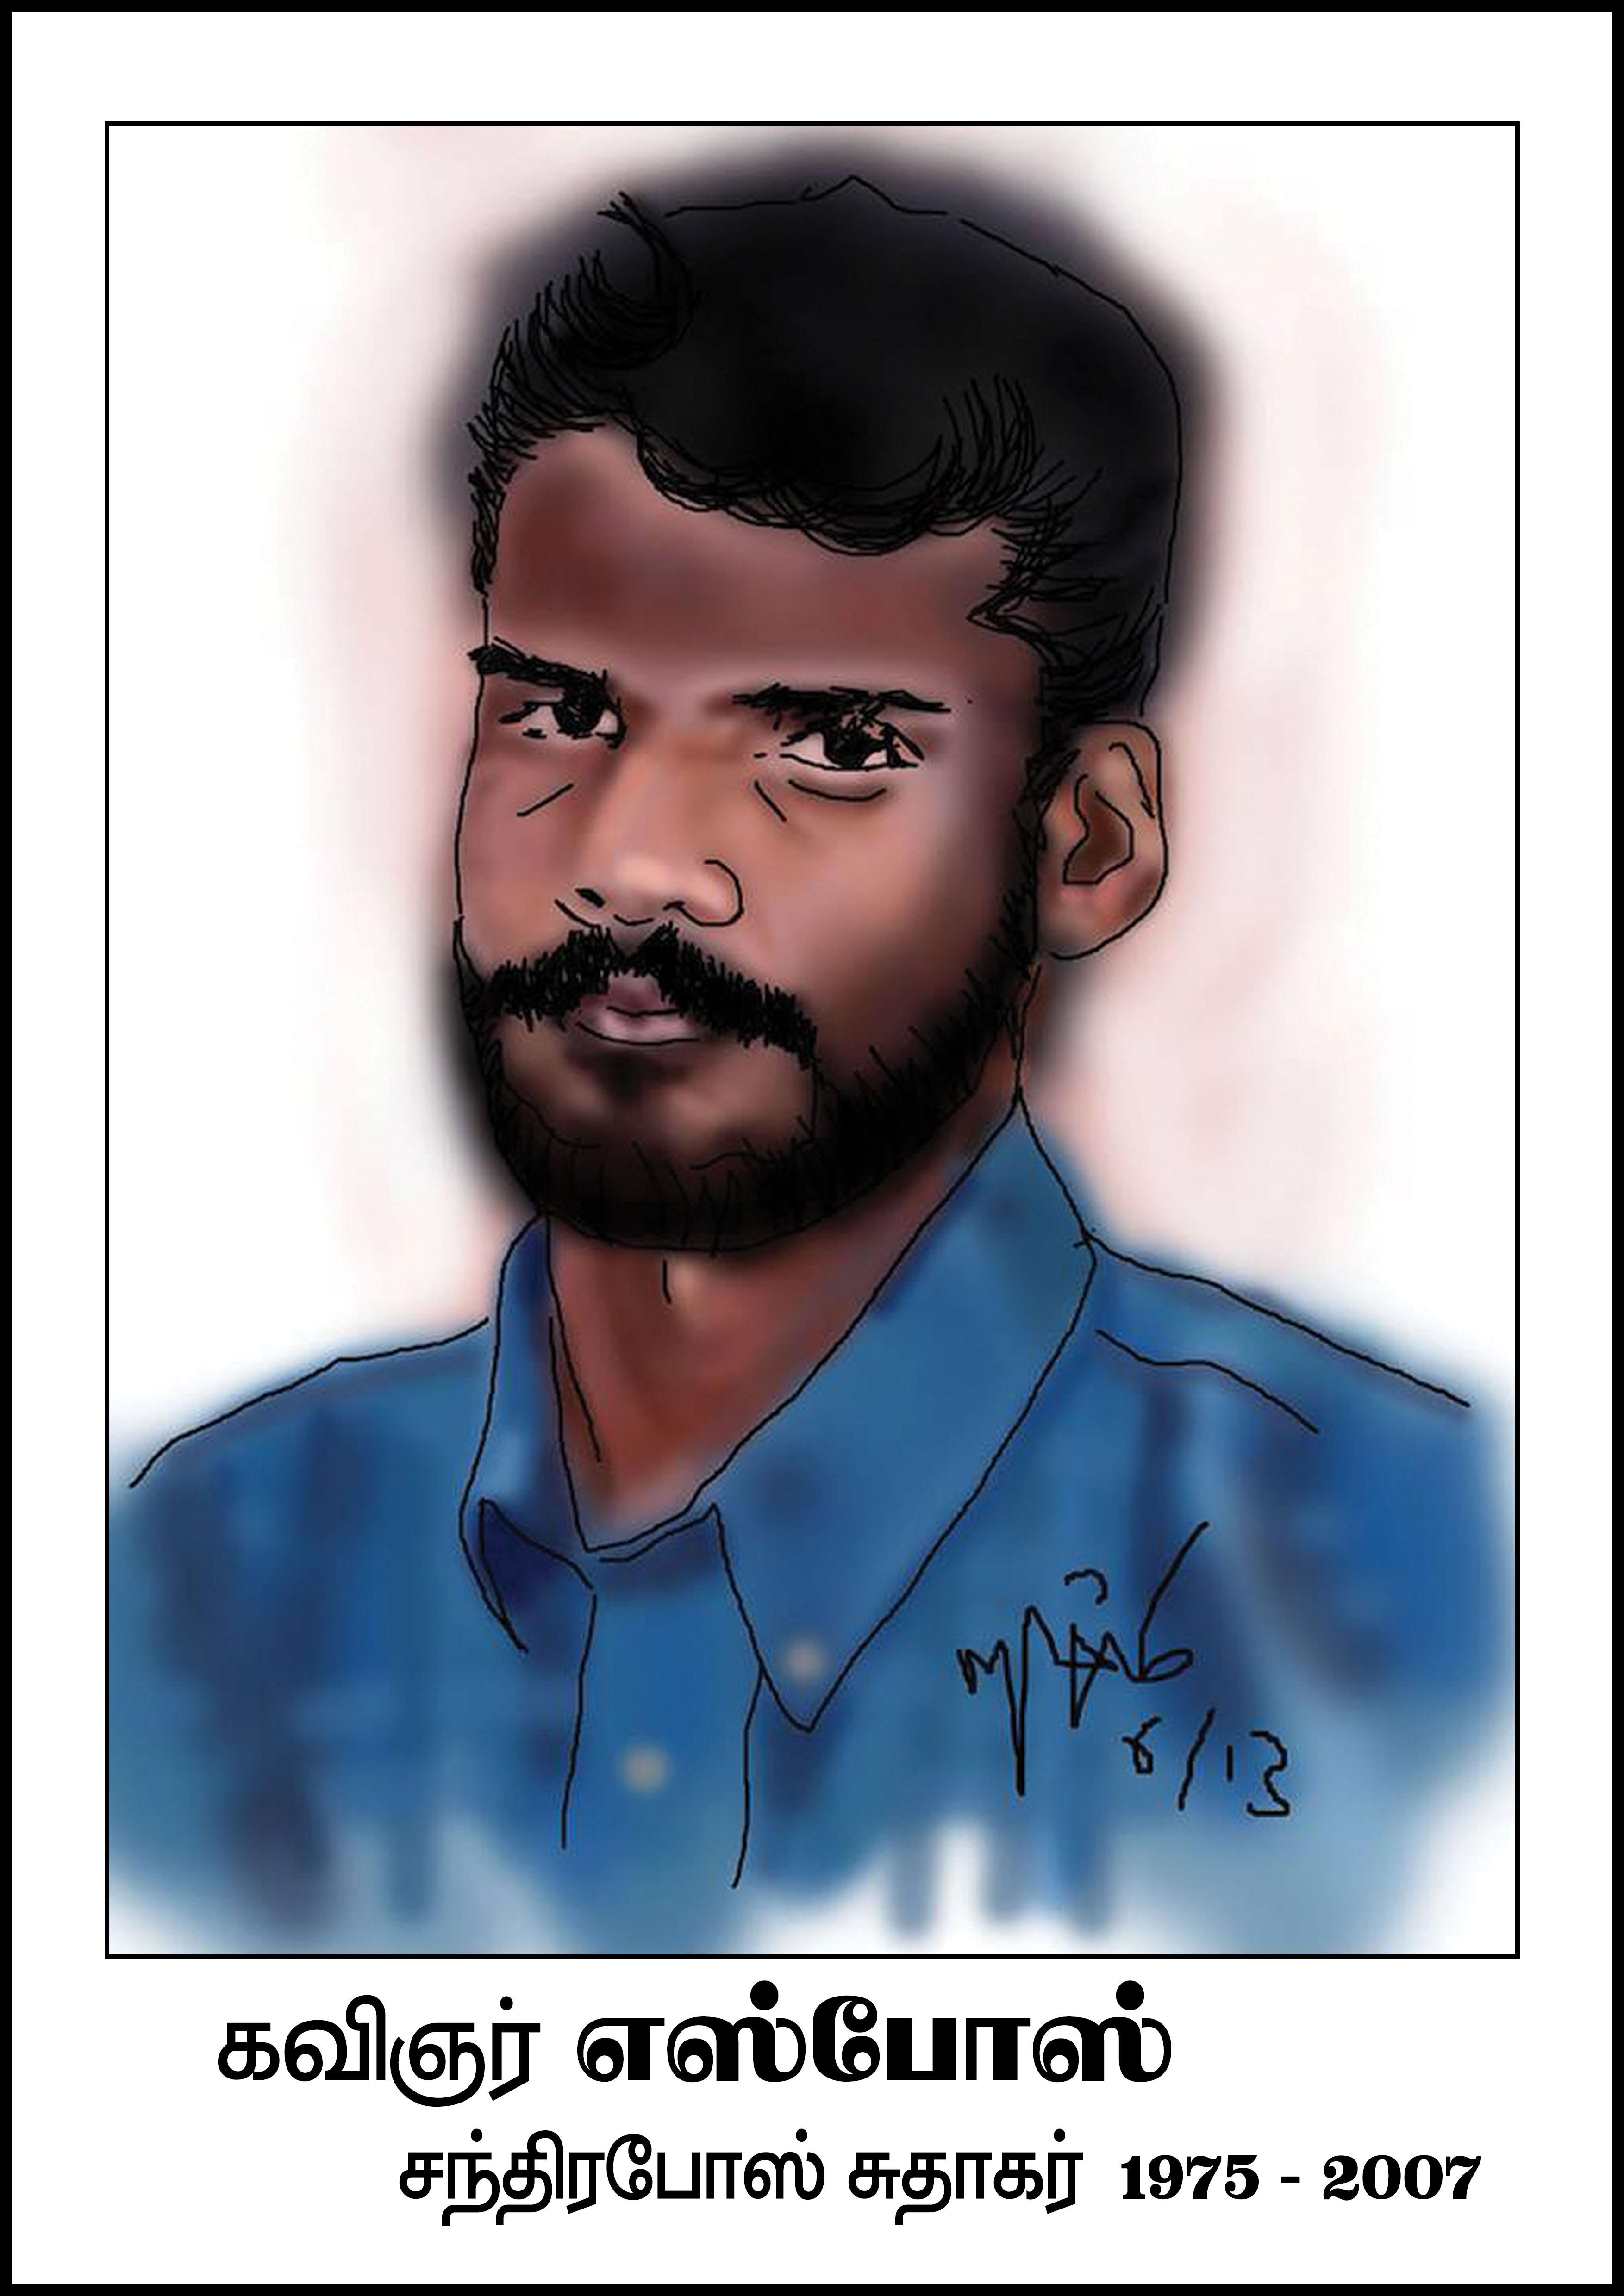 Marupathi # SBose - Colour Print